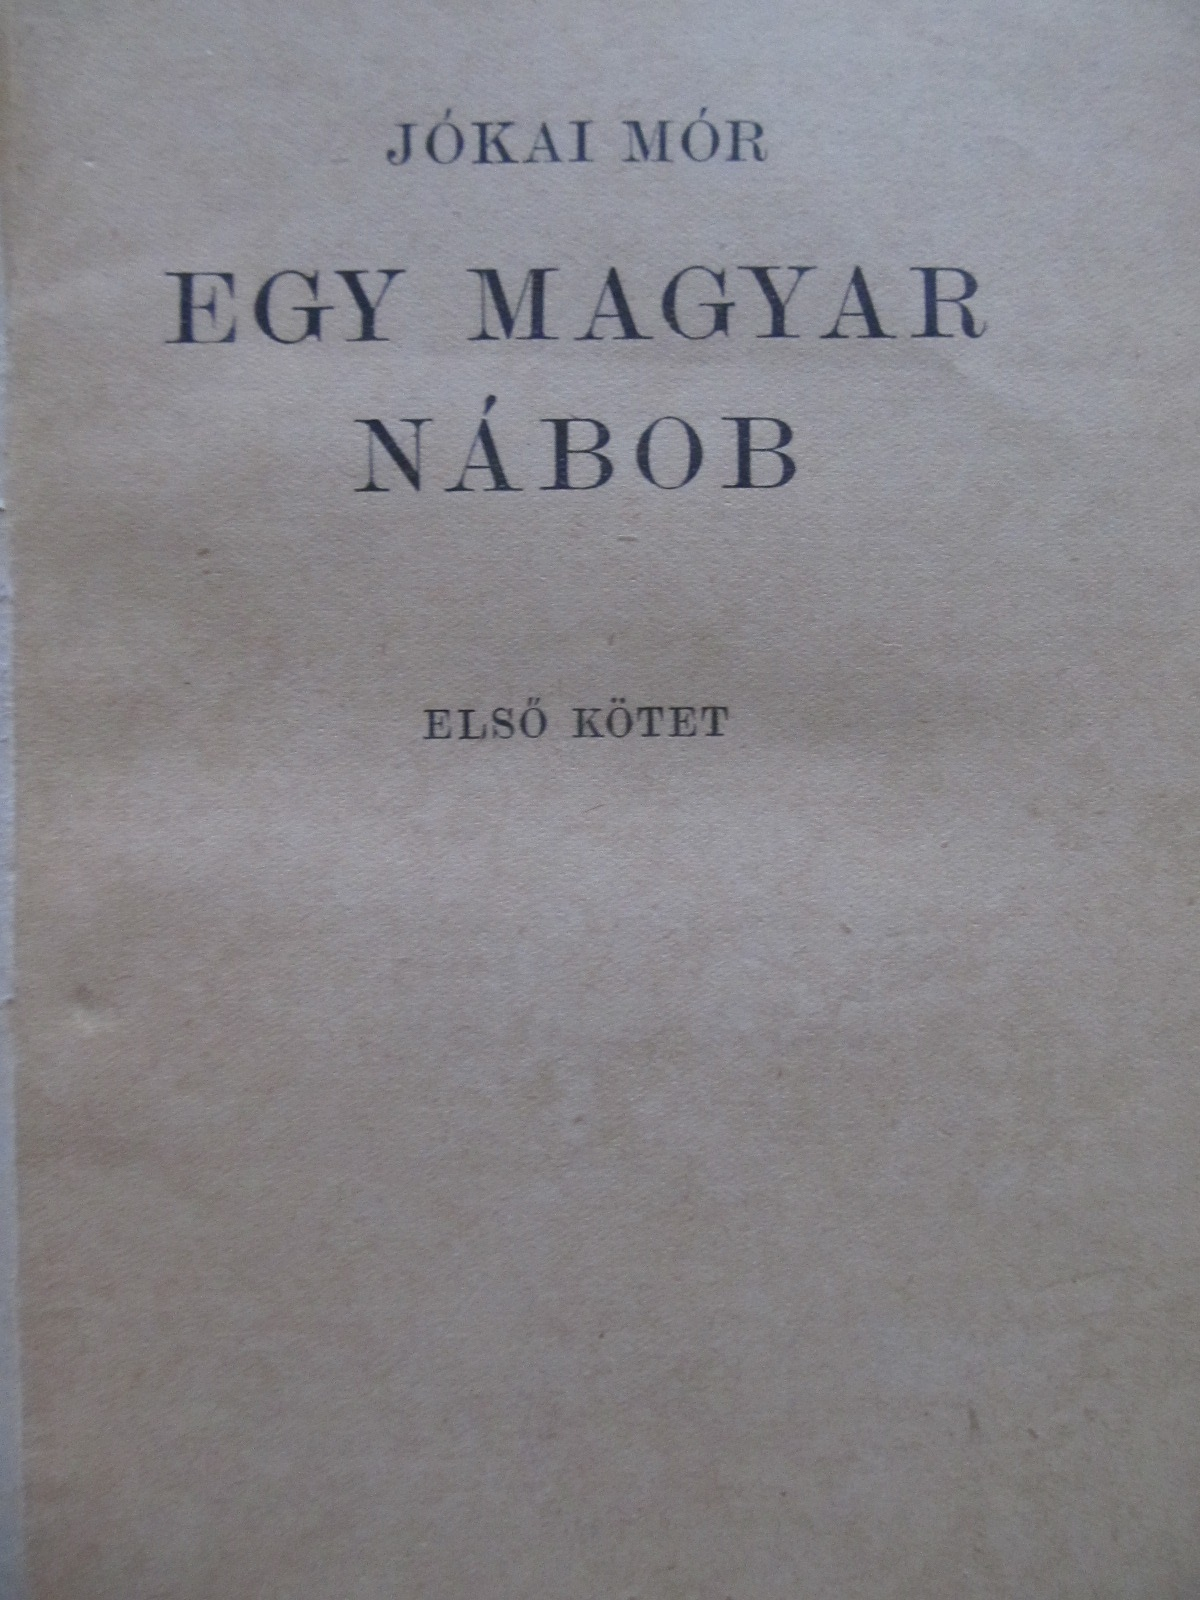 Egy magyar nabob (2 vol.) - colegate - Jokai Mor | Detalii carte